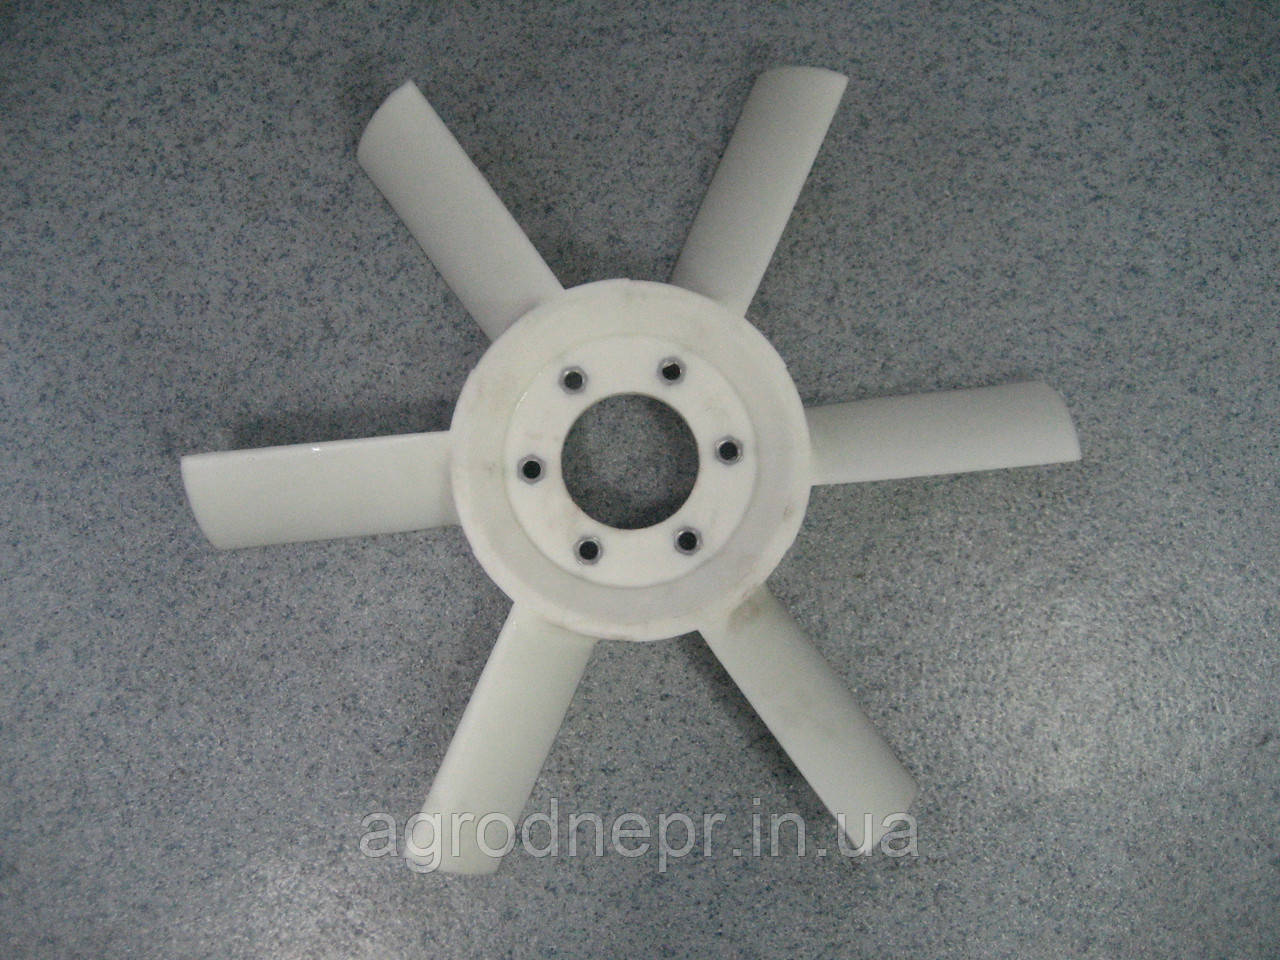 245-1308010-01 Вентилятор радиатора МТЗ  240-1308040-01 245-1308010-01